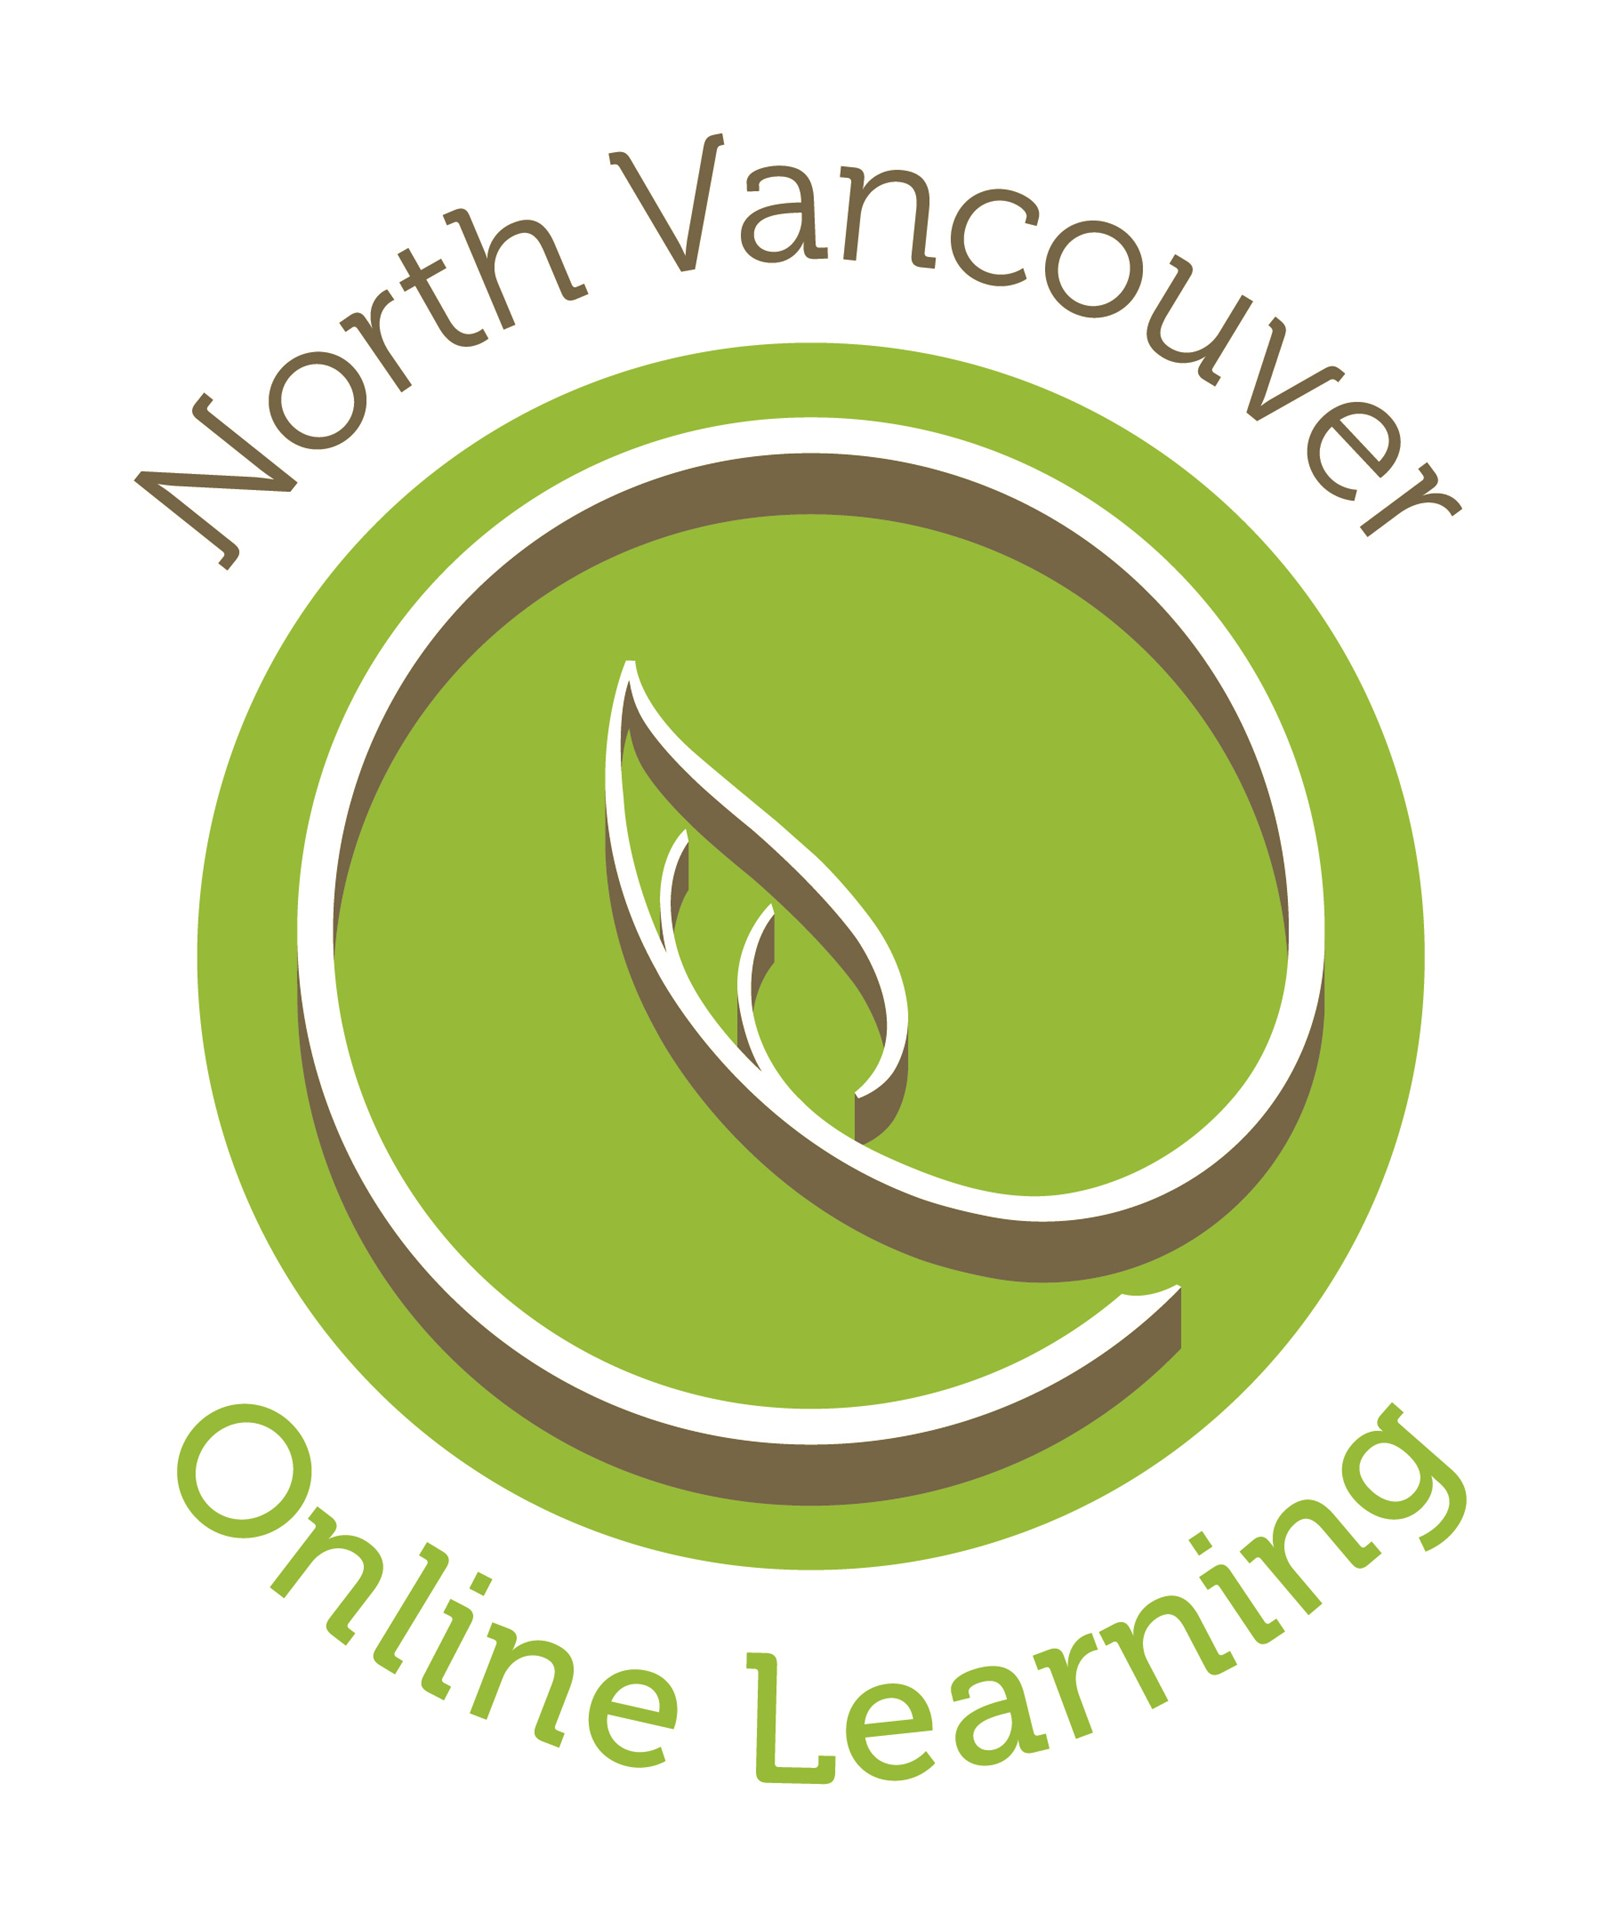 NV_OnlineLearning_Horizontal.Logo-01.jpg